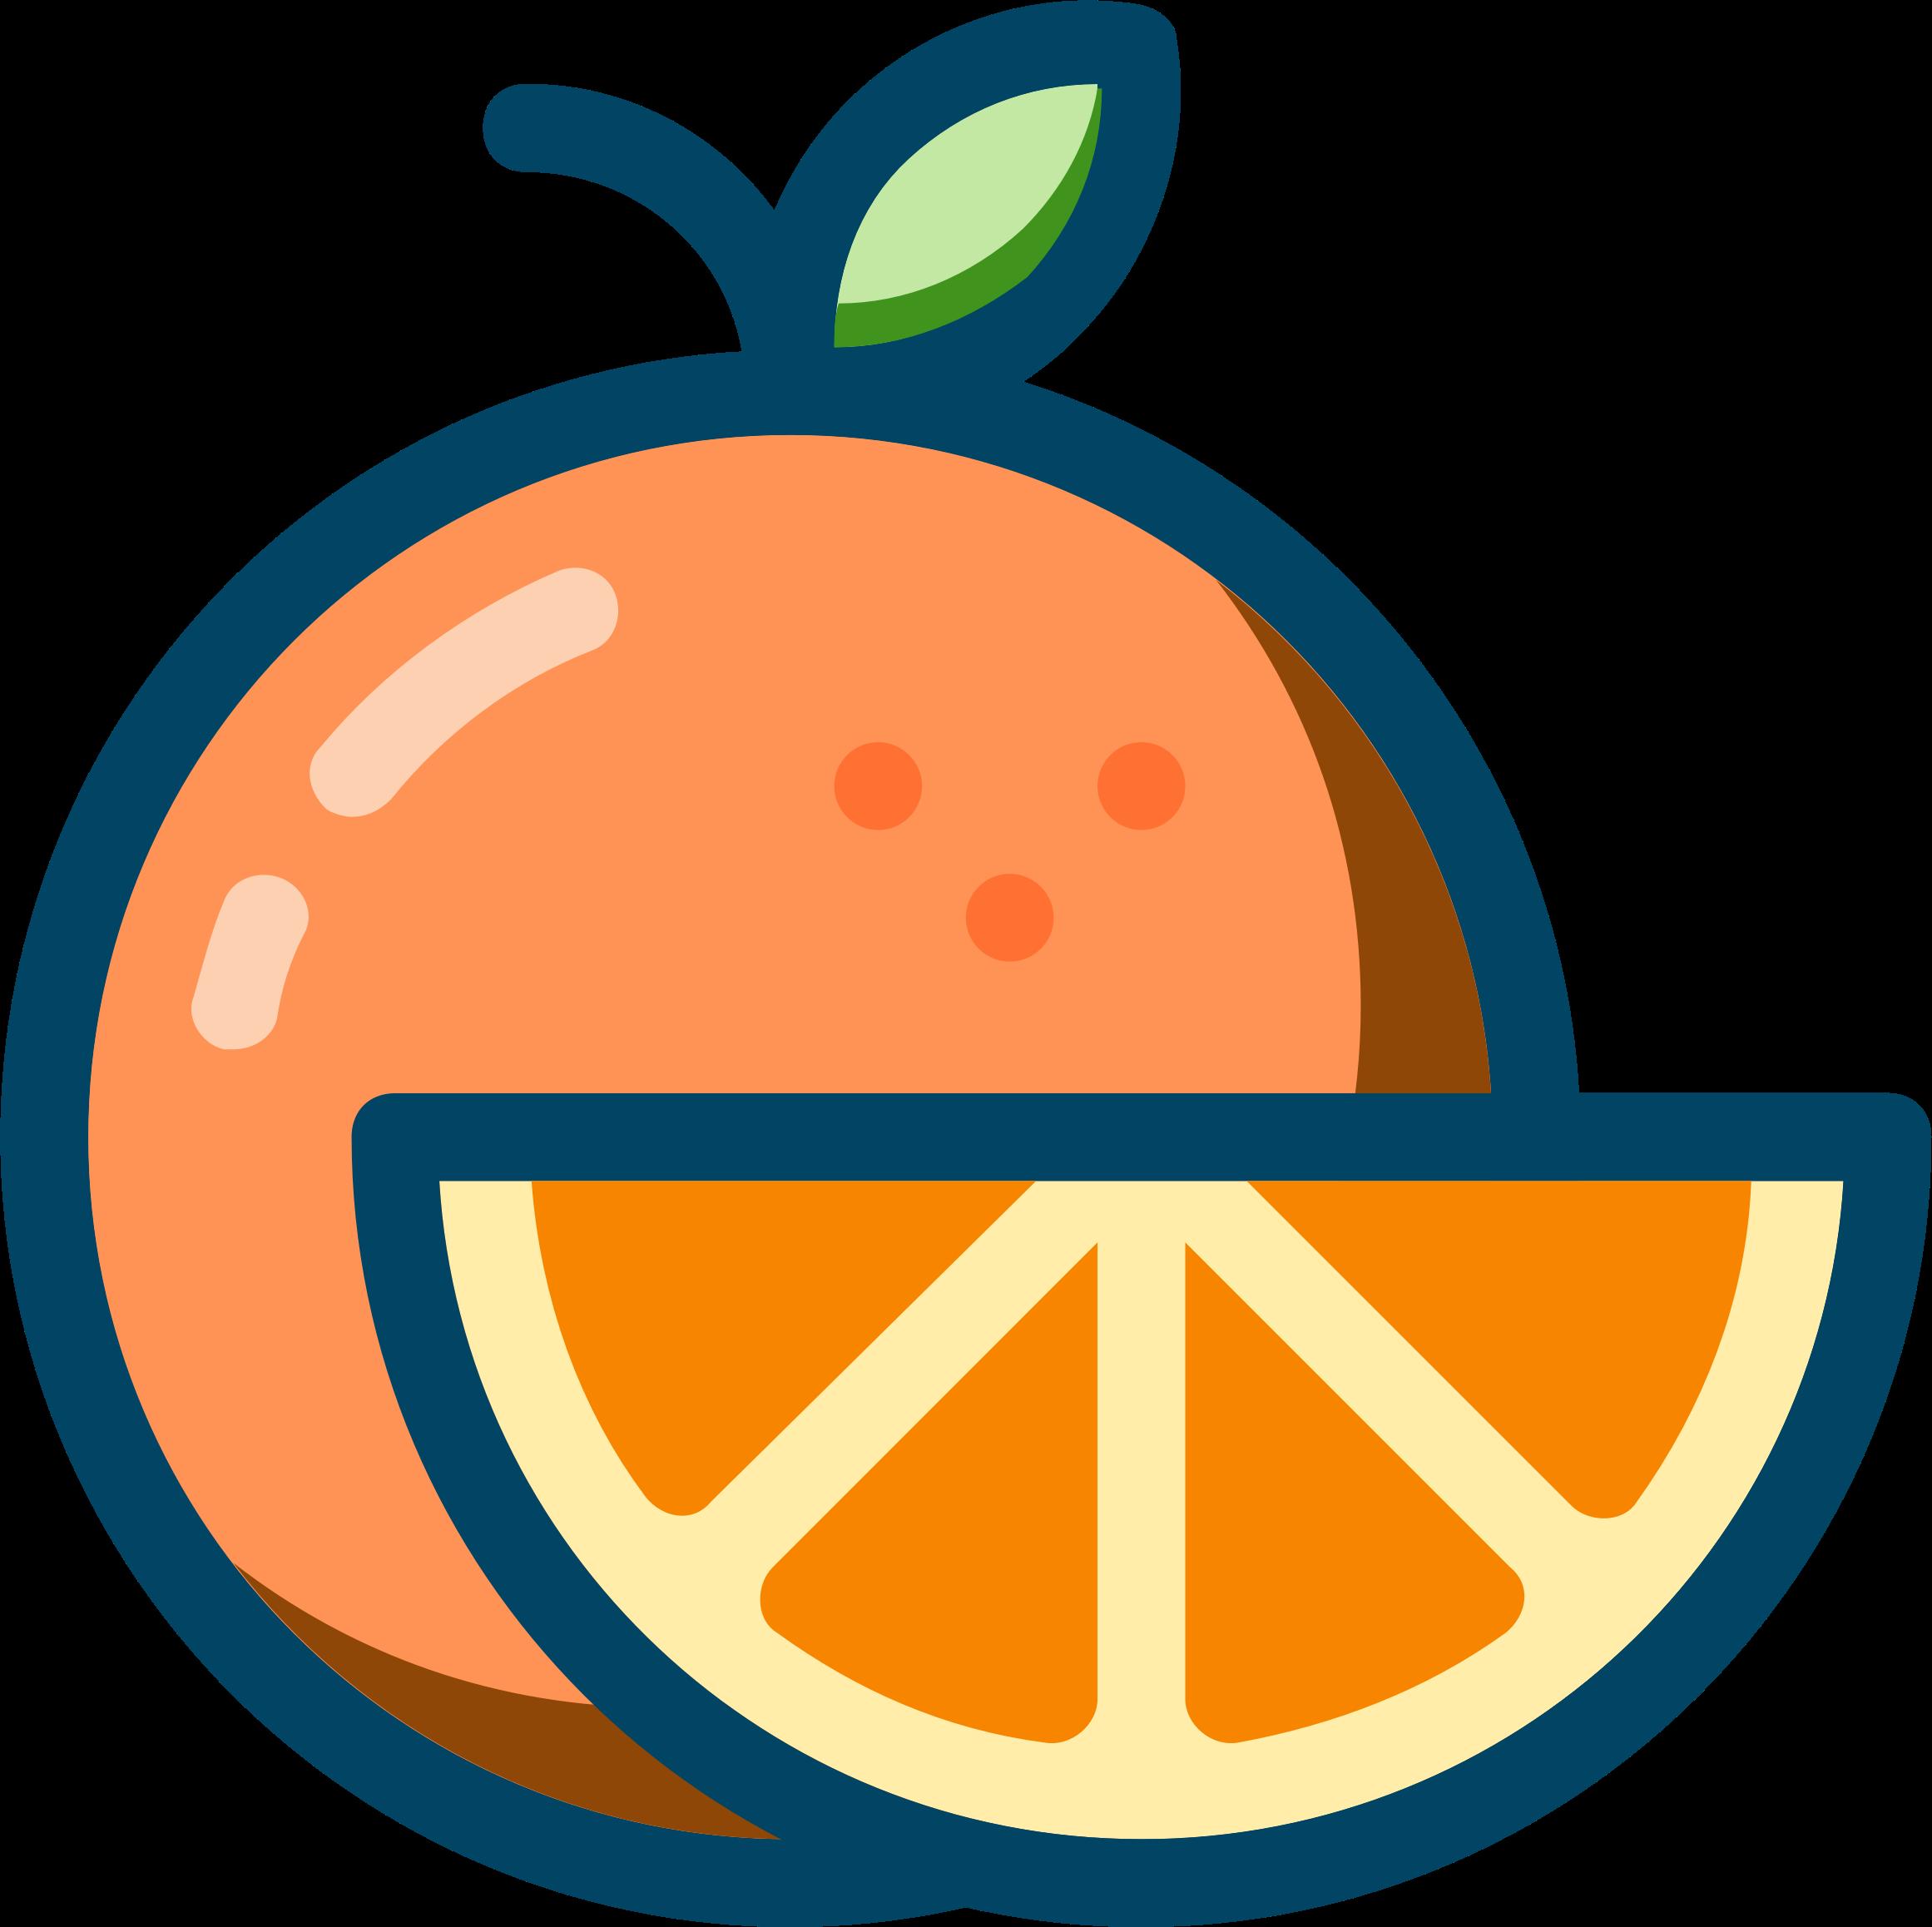 Pumpkin juice clipart jpg free library Orange juice Clip art - Orange Slice 2322*2316 transprent Png Free ... jpg free library